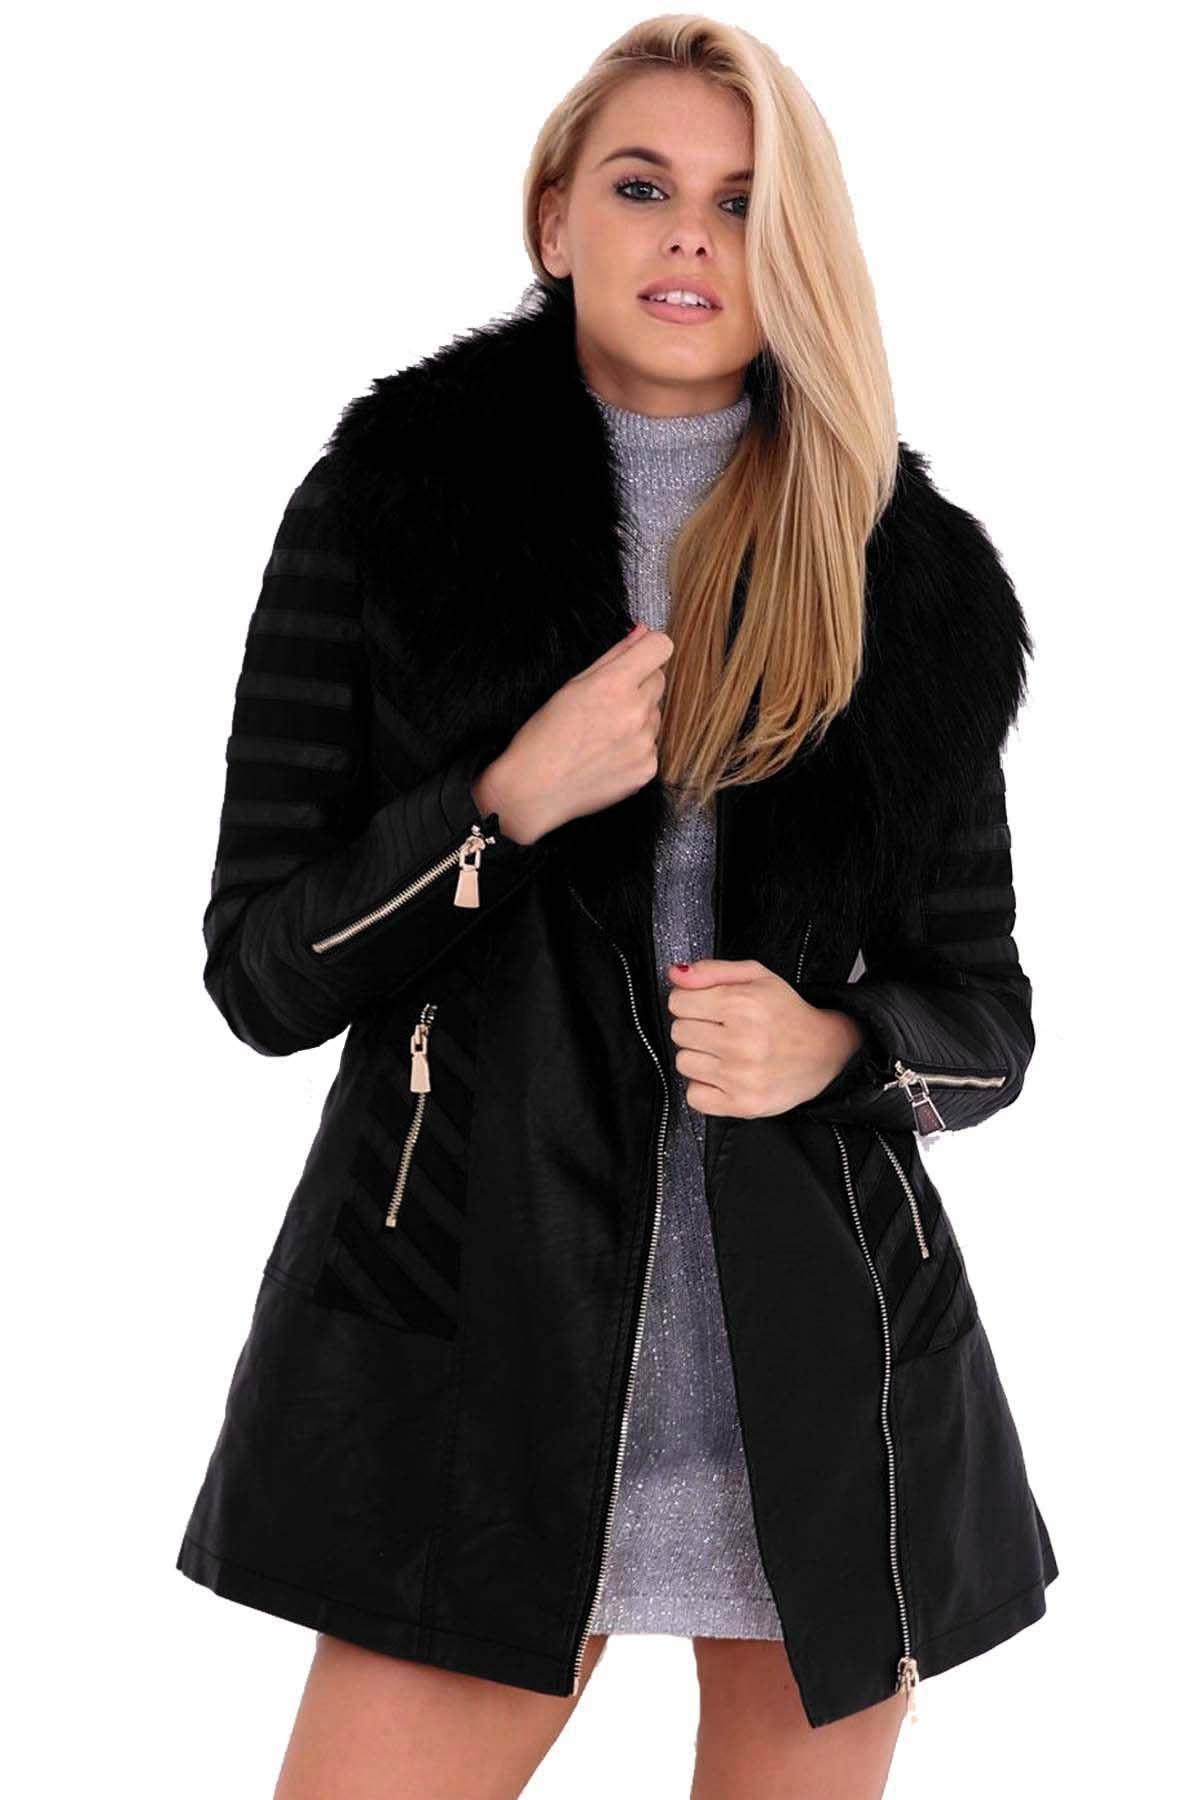 ladies faux pvc leather fur collar mesh insert long pu zipper coat jacket ebay. Black Bedroom Furniture Sets. Home Design Ideas